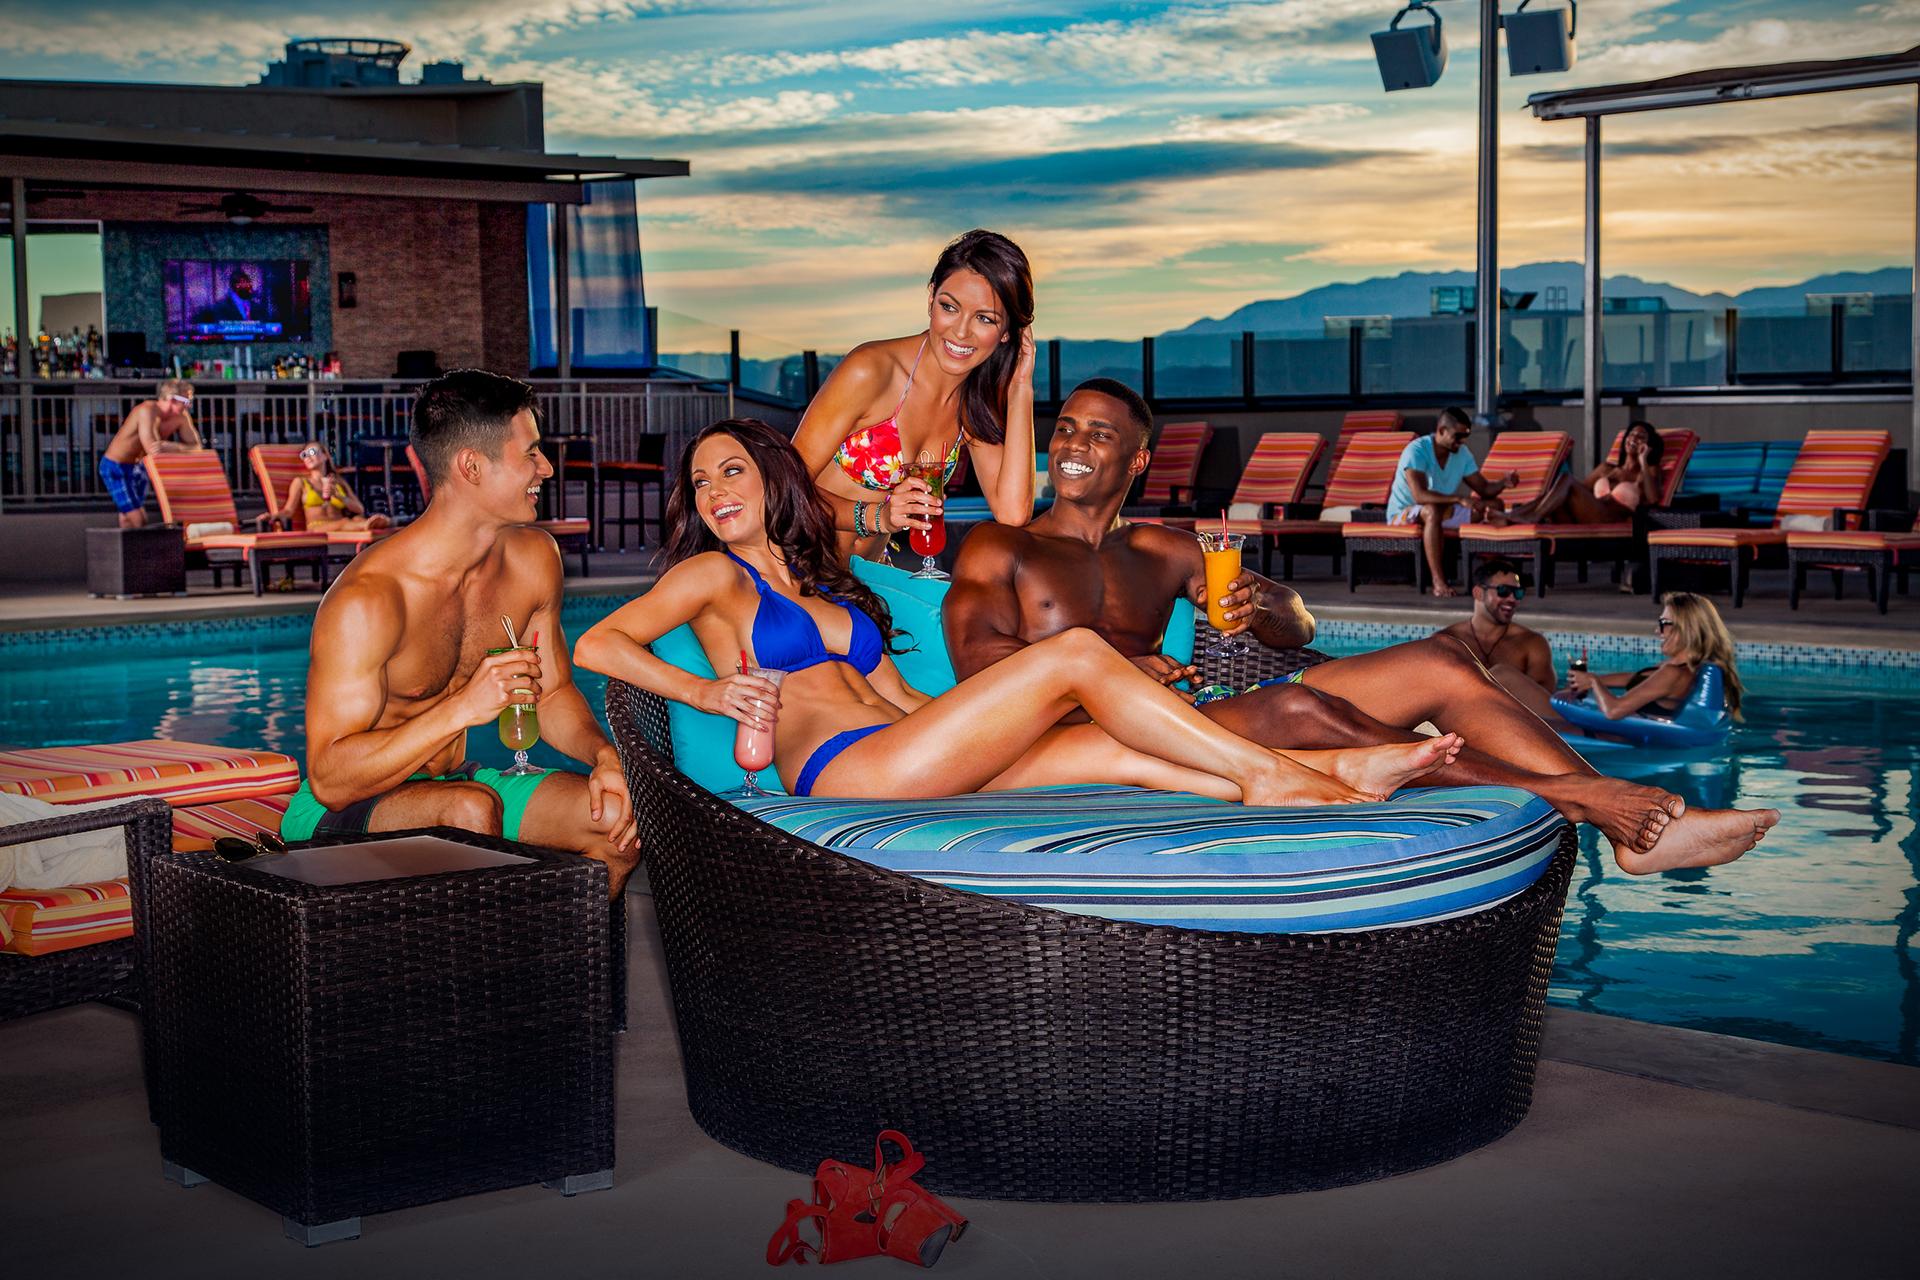 Topless vegas pool